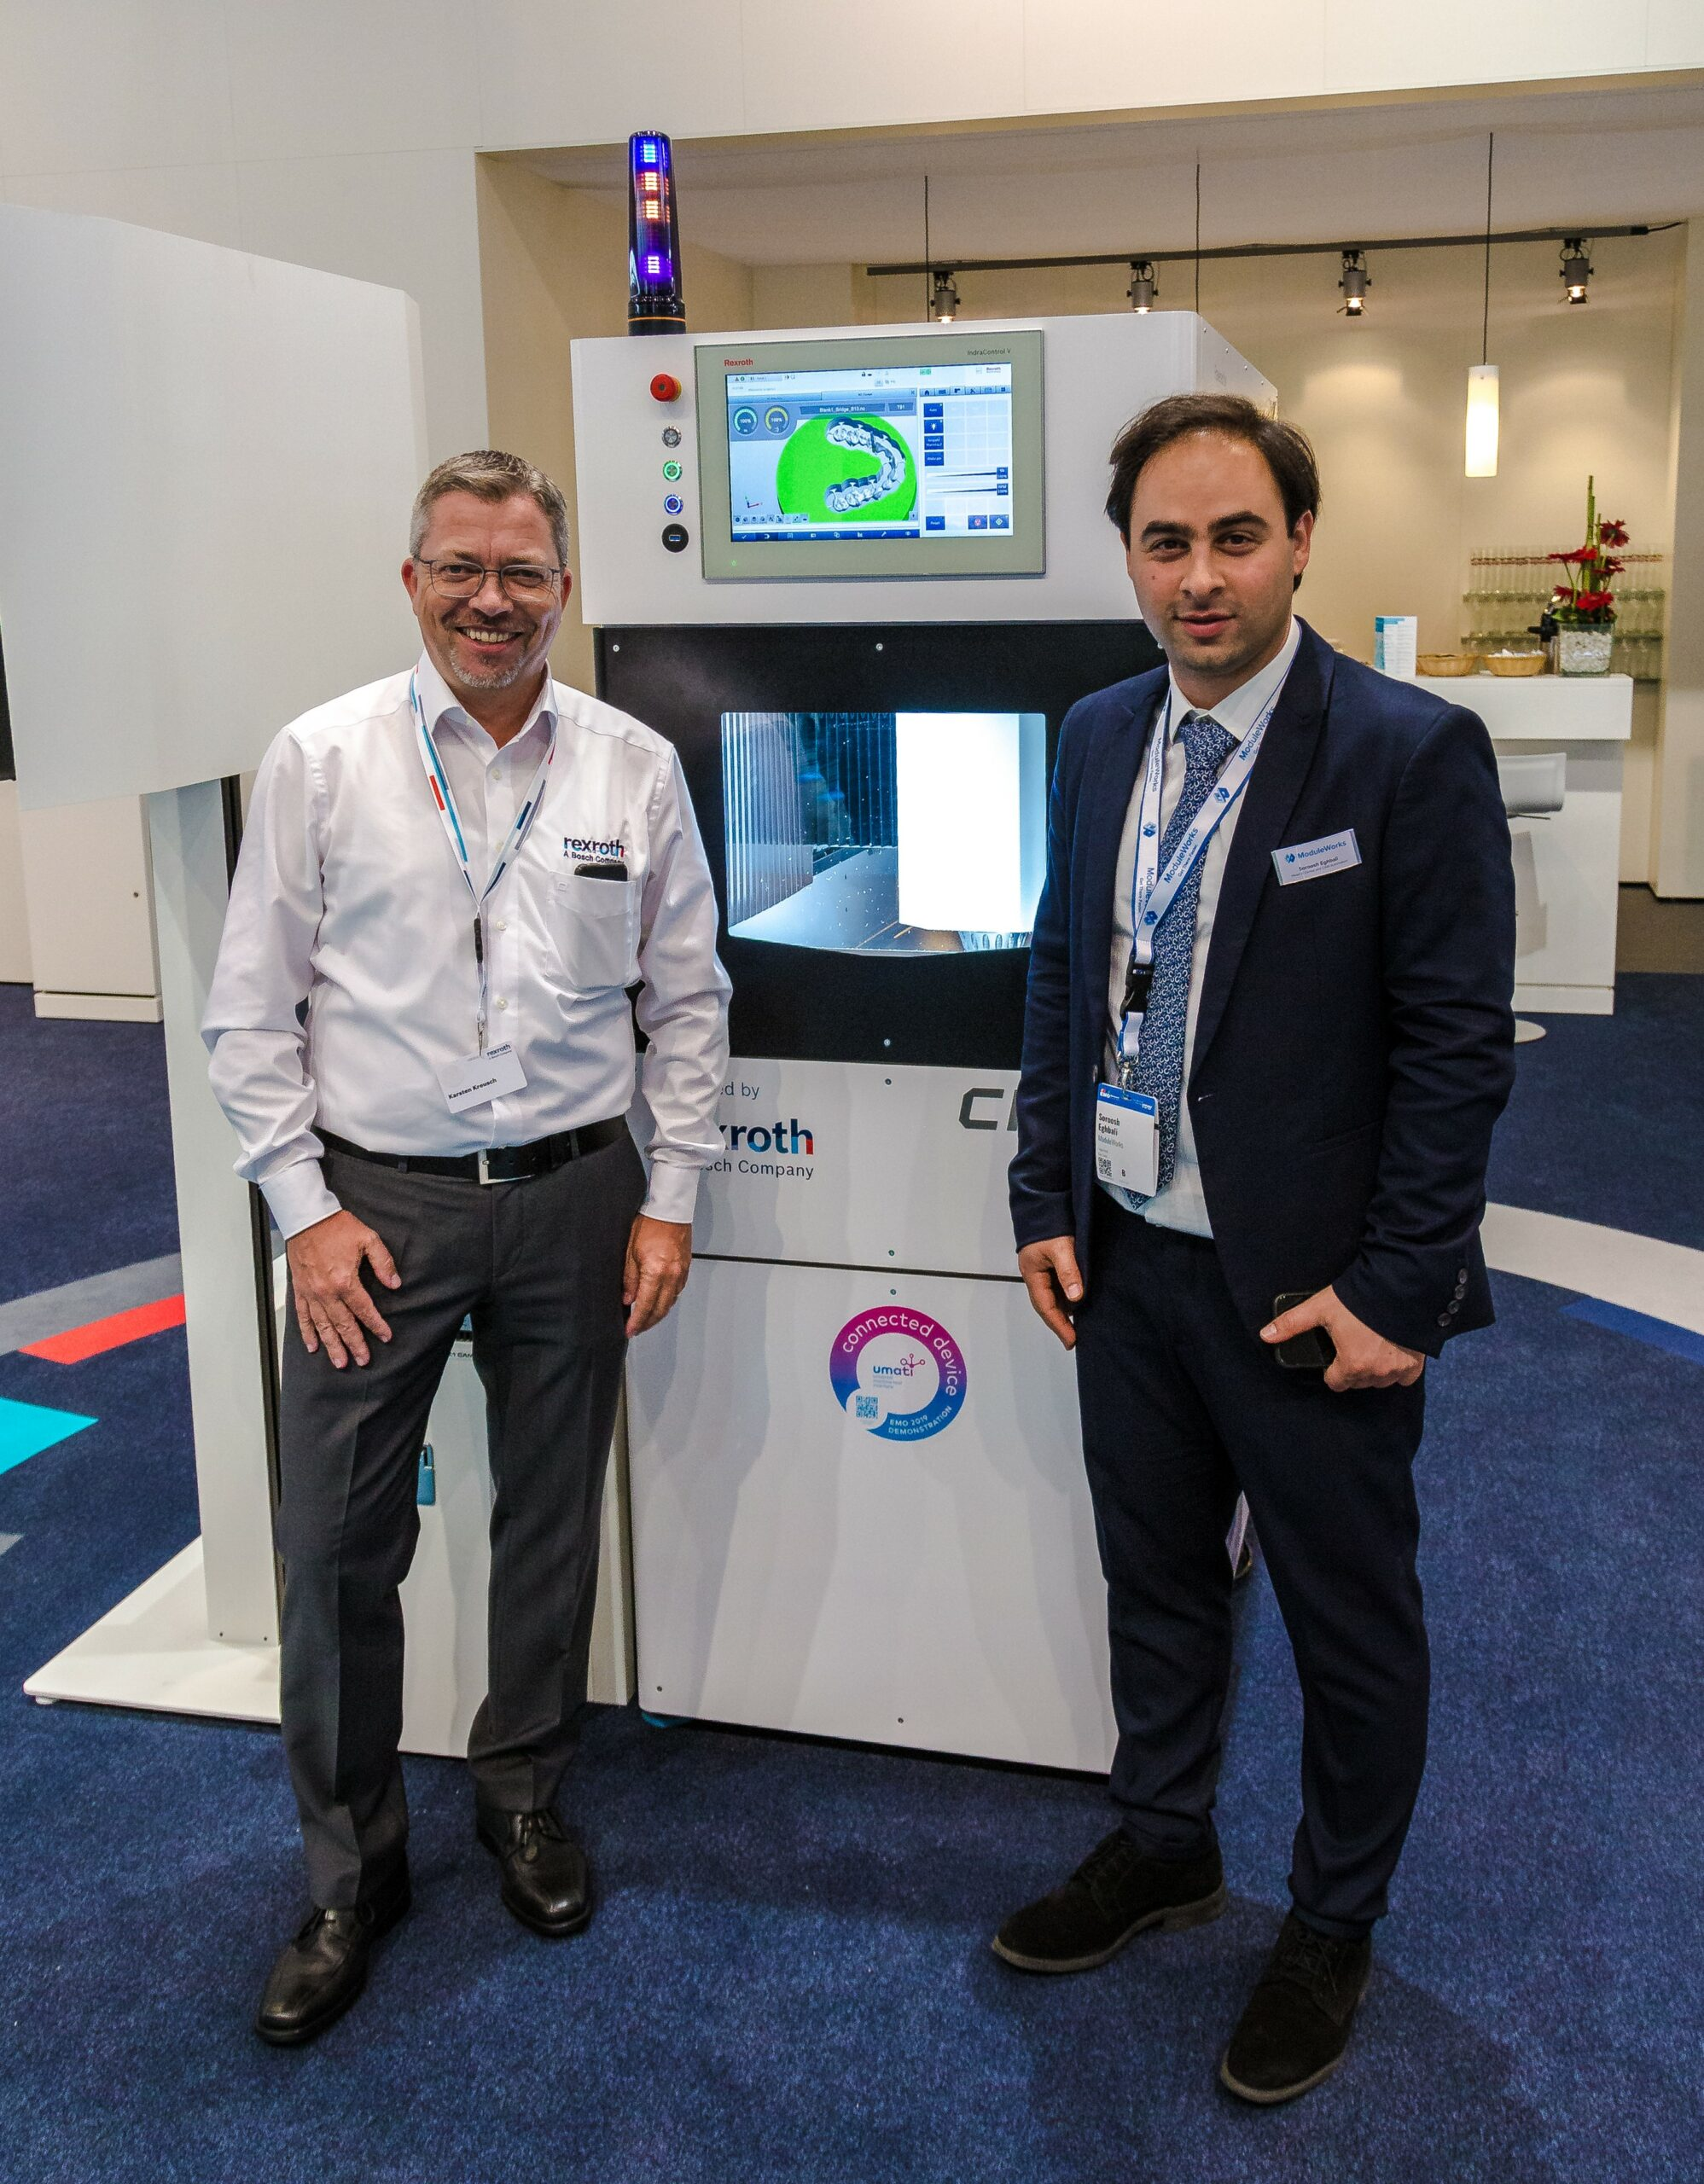 Dr. Karsten Kreusch and Soroosh Eghbali